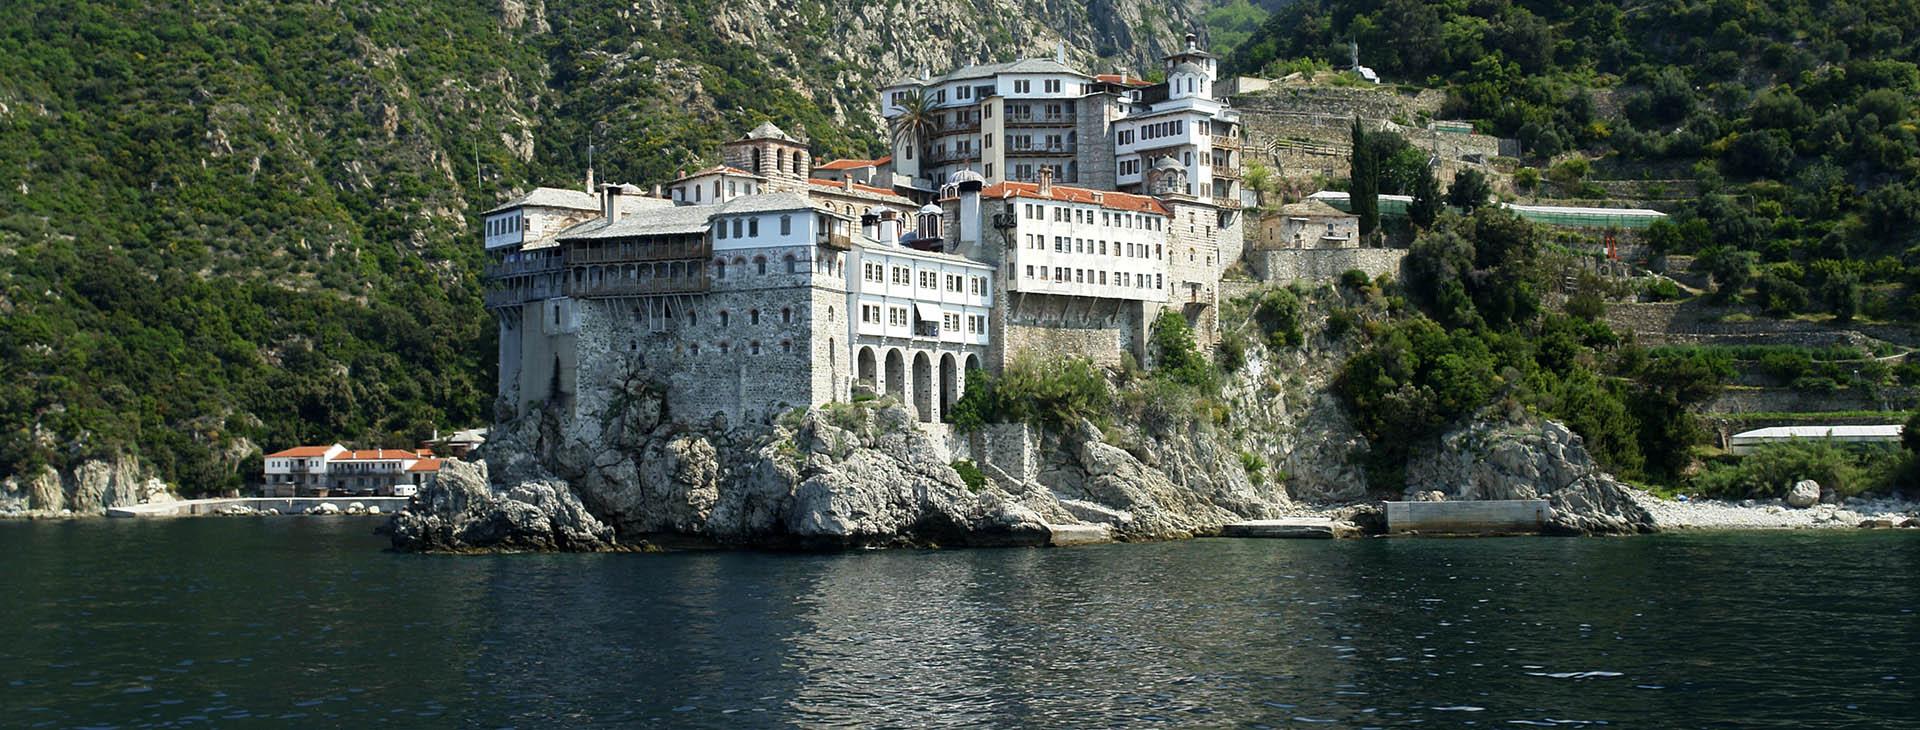 Monastery at Mt. Athos, Halkidiki (Chalkidiki)